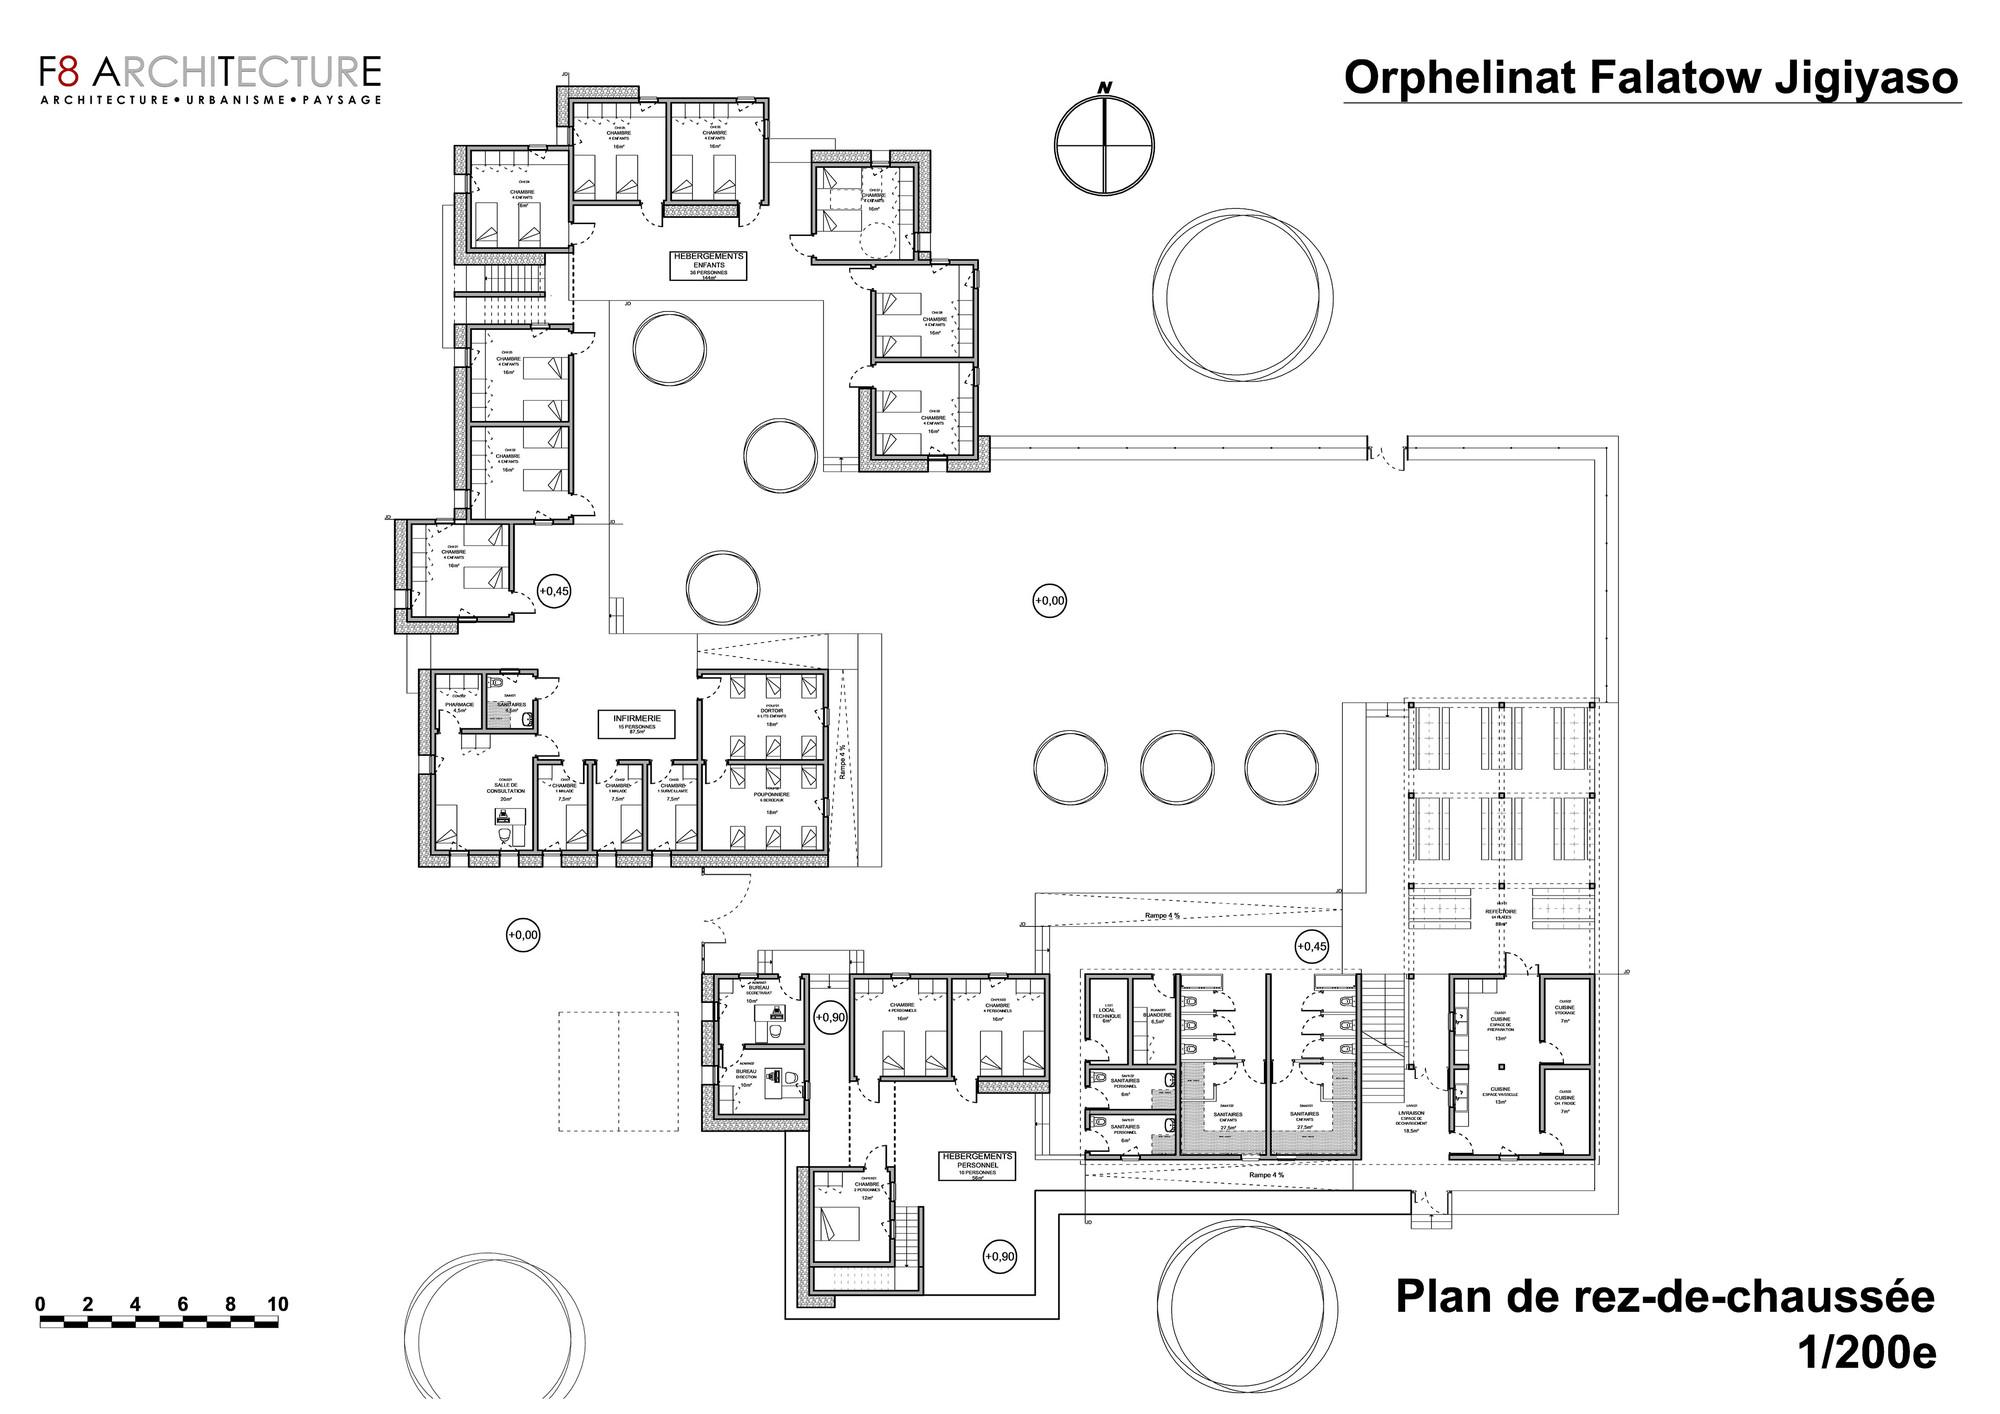 Gallery Of Falatow Jigiyaso Orphanage F8 Architecture